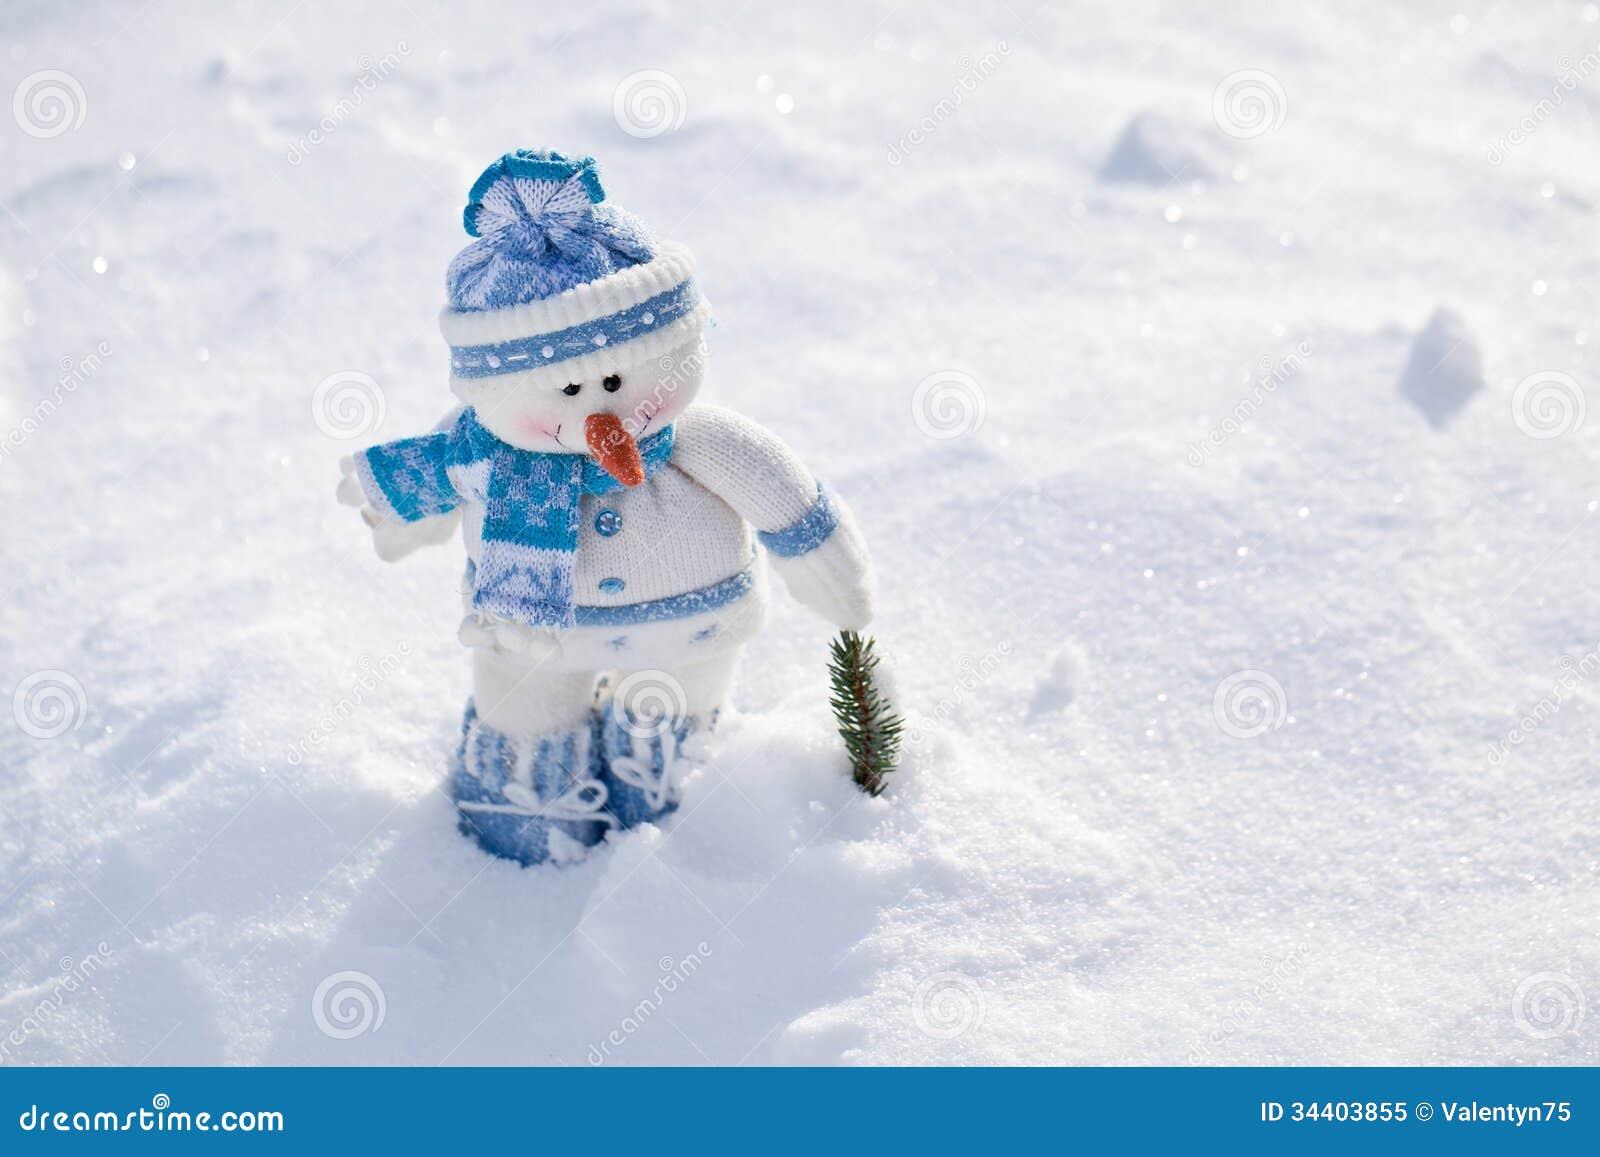 Carrot Nose Clipart Snowman Carrot Nose Clipart